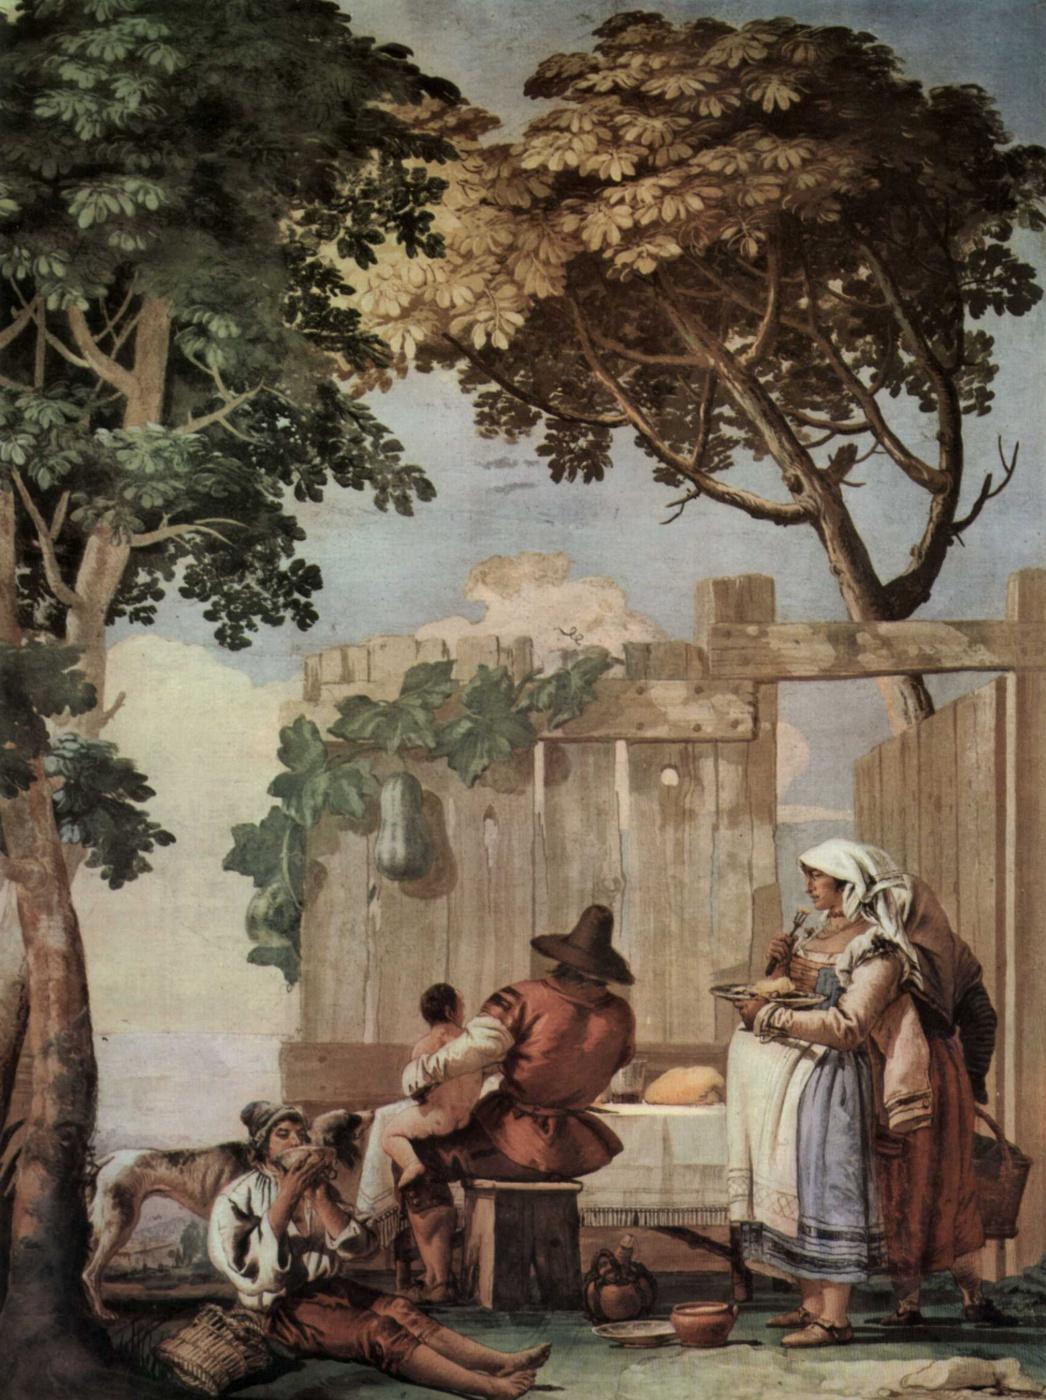 Giovanni Domenico Tiepolo. The frescoes of Villa Valmarana in Vicenza. Peasant family at table